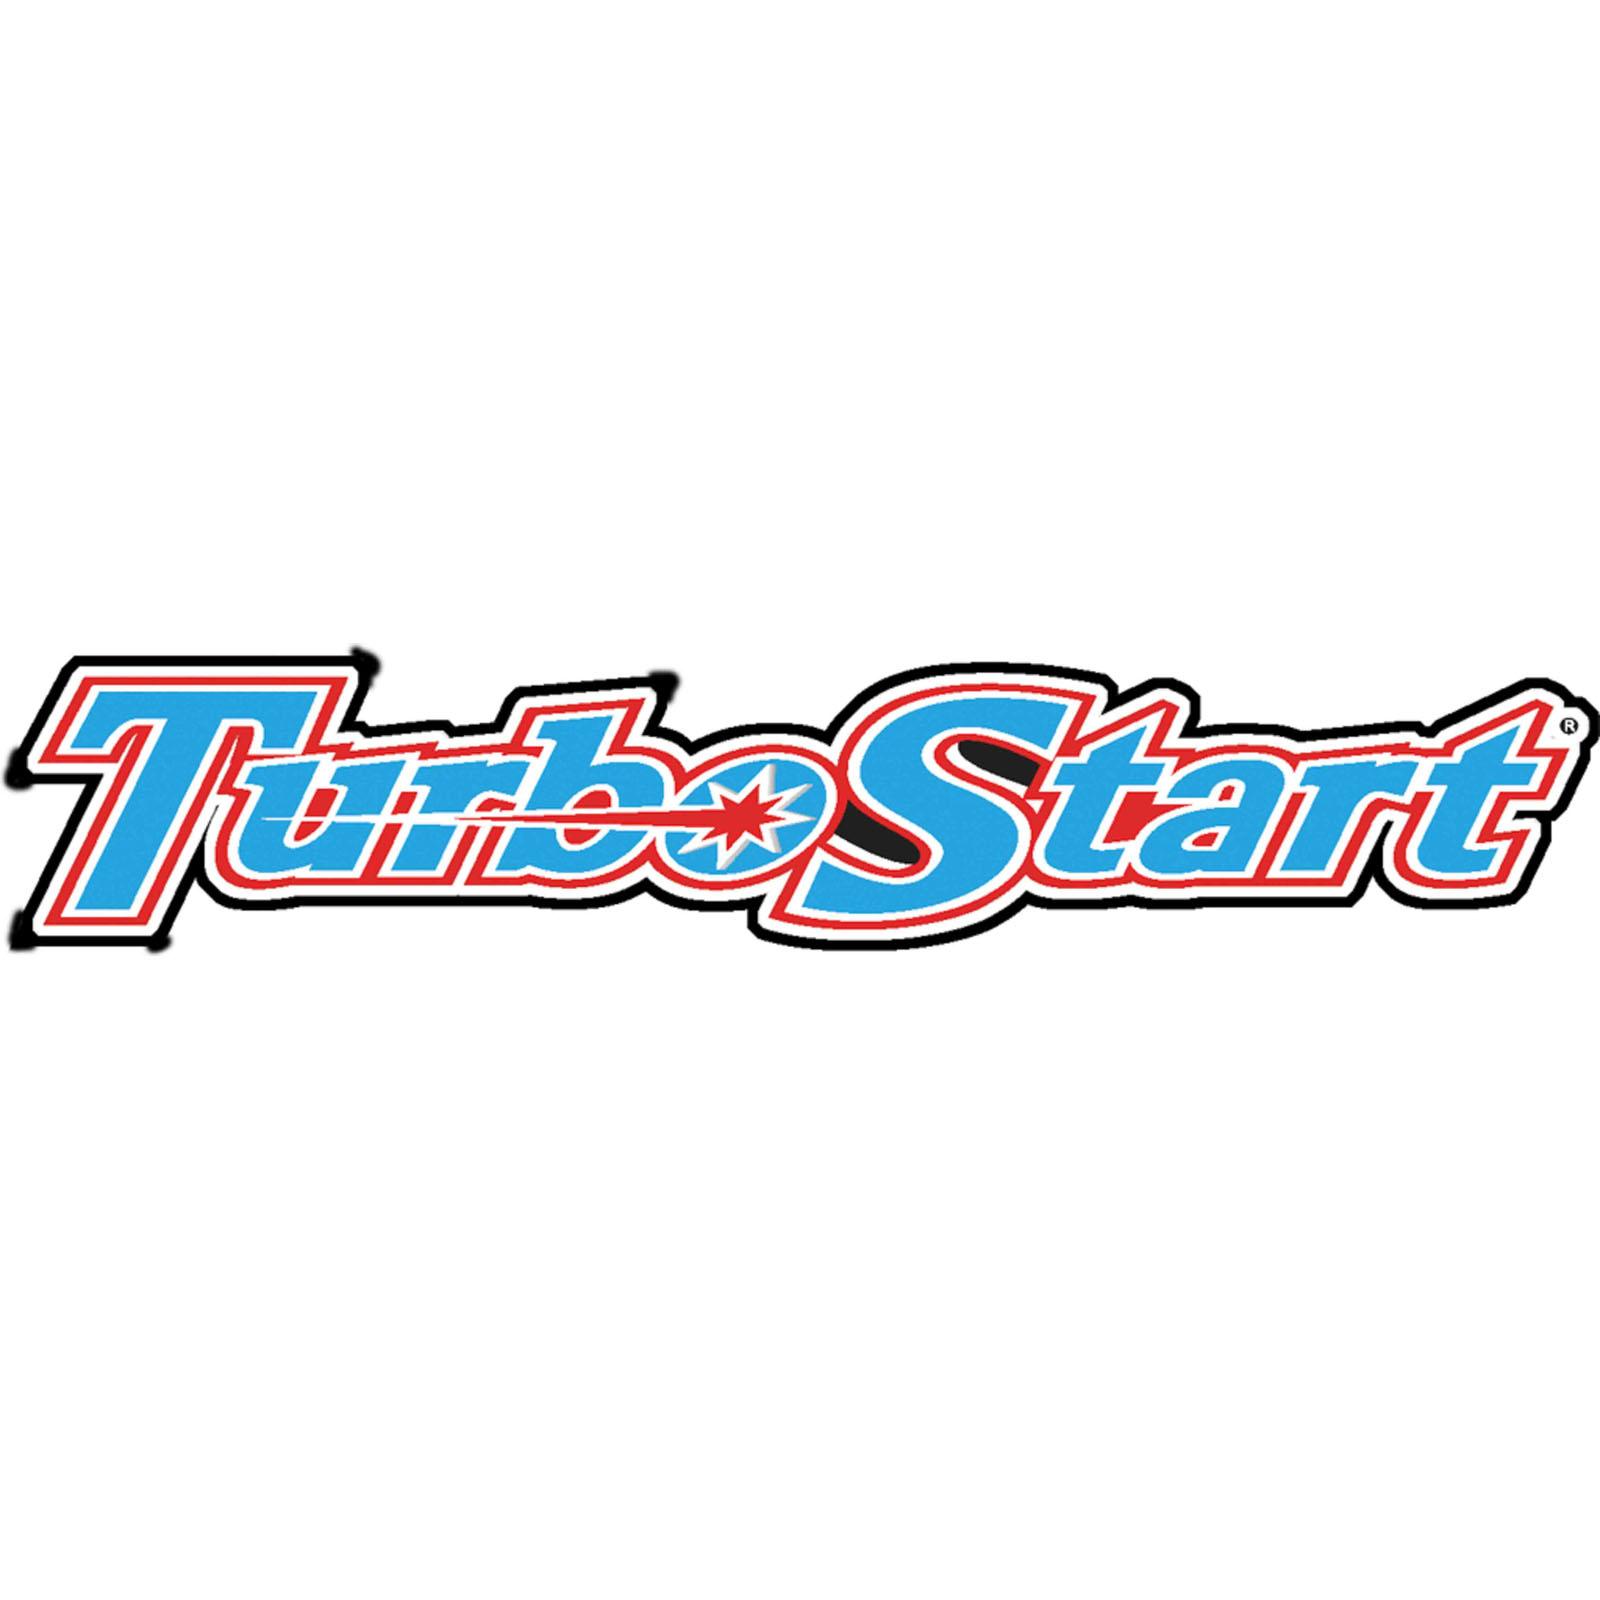 TURBO START TRB100 Turbo Start Catalog Volume 9.1